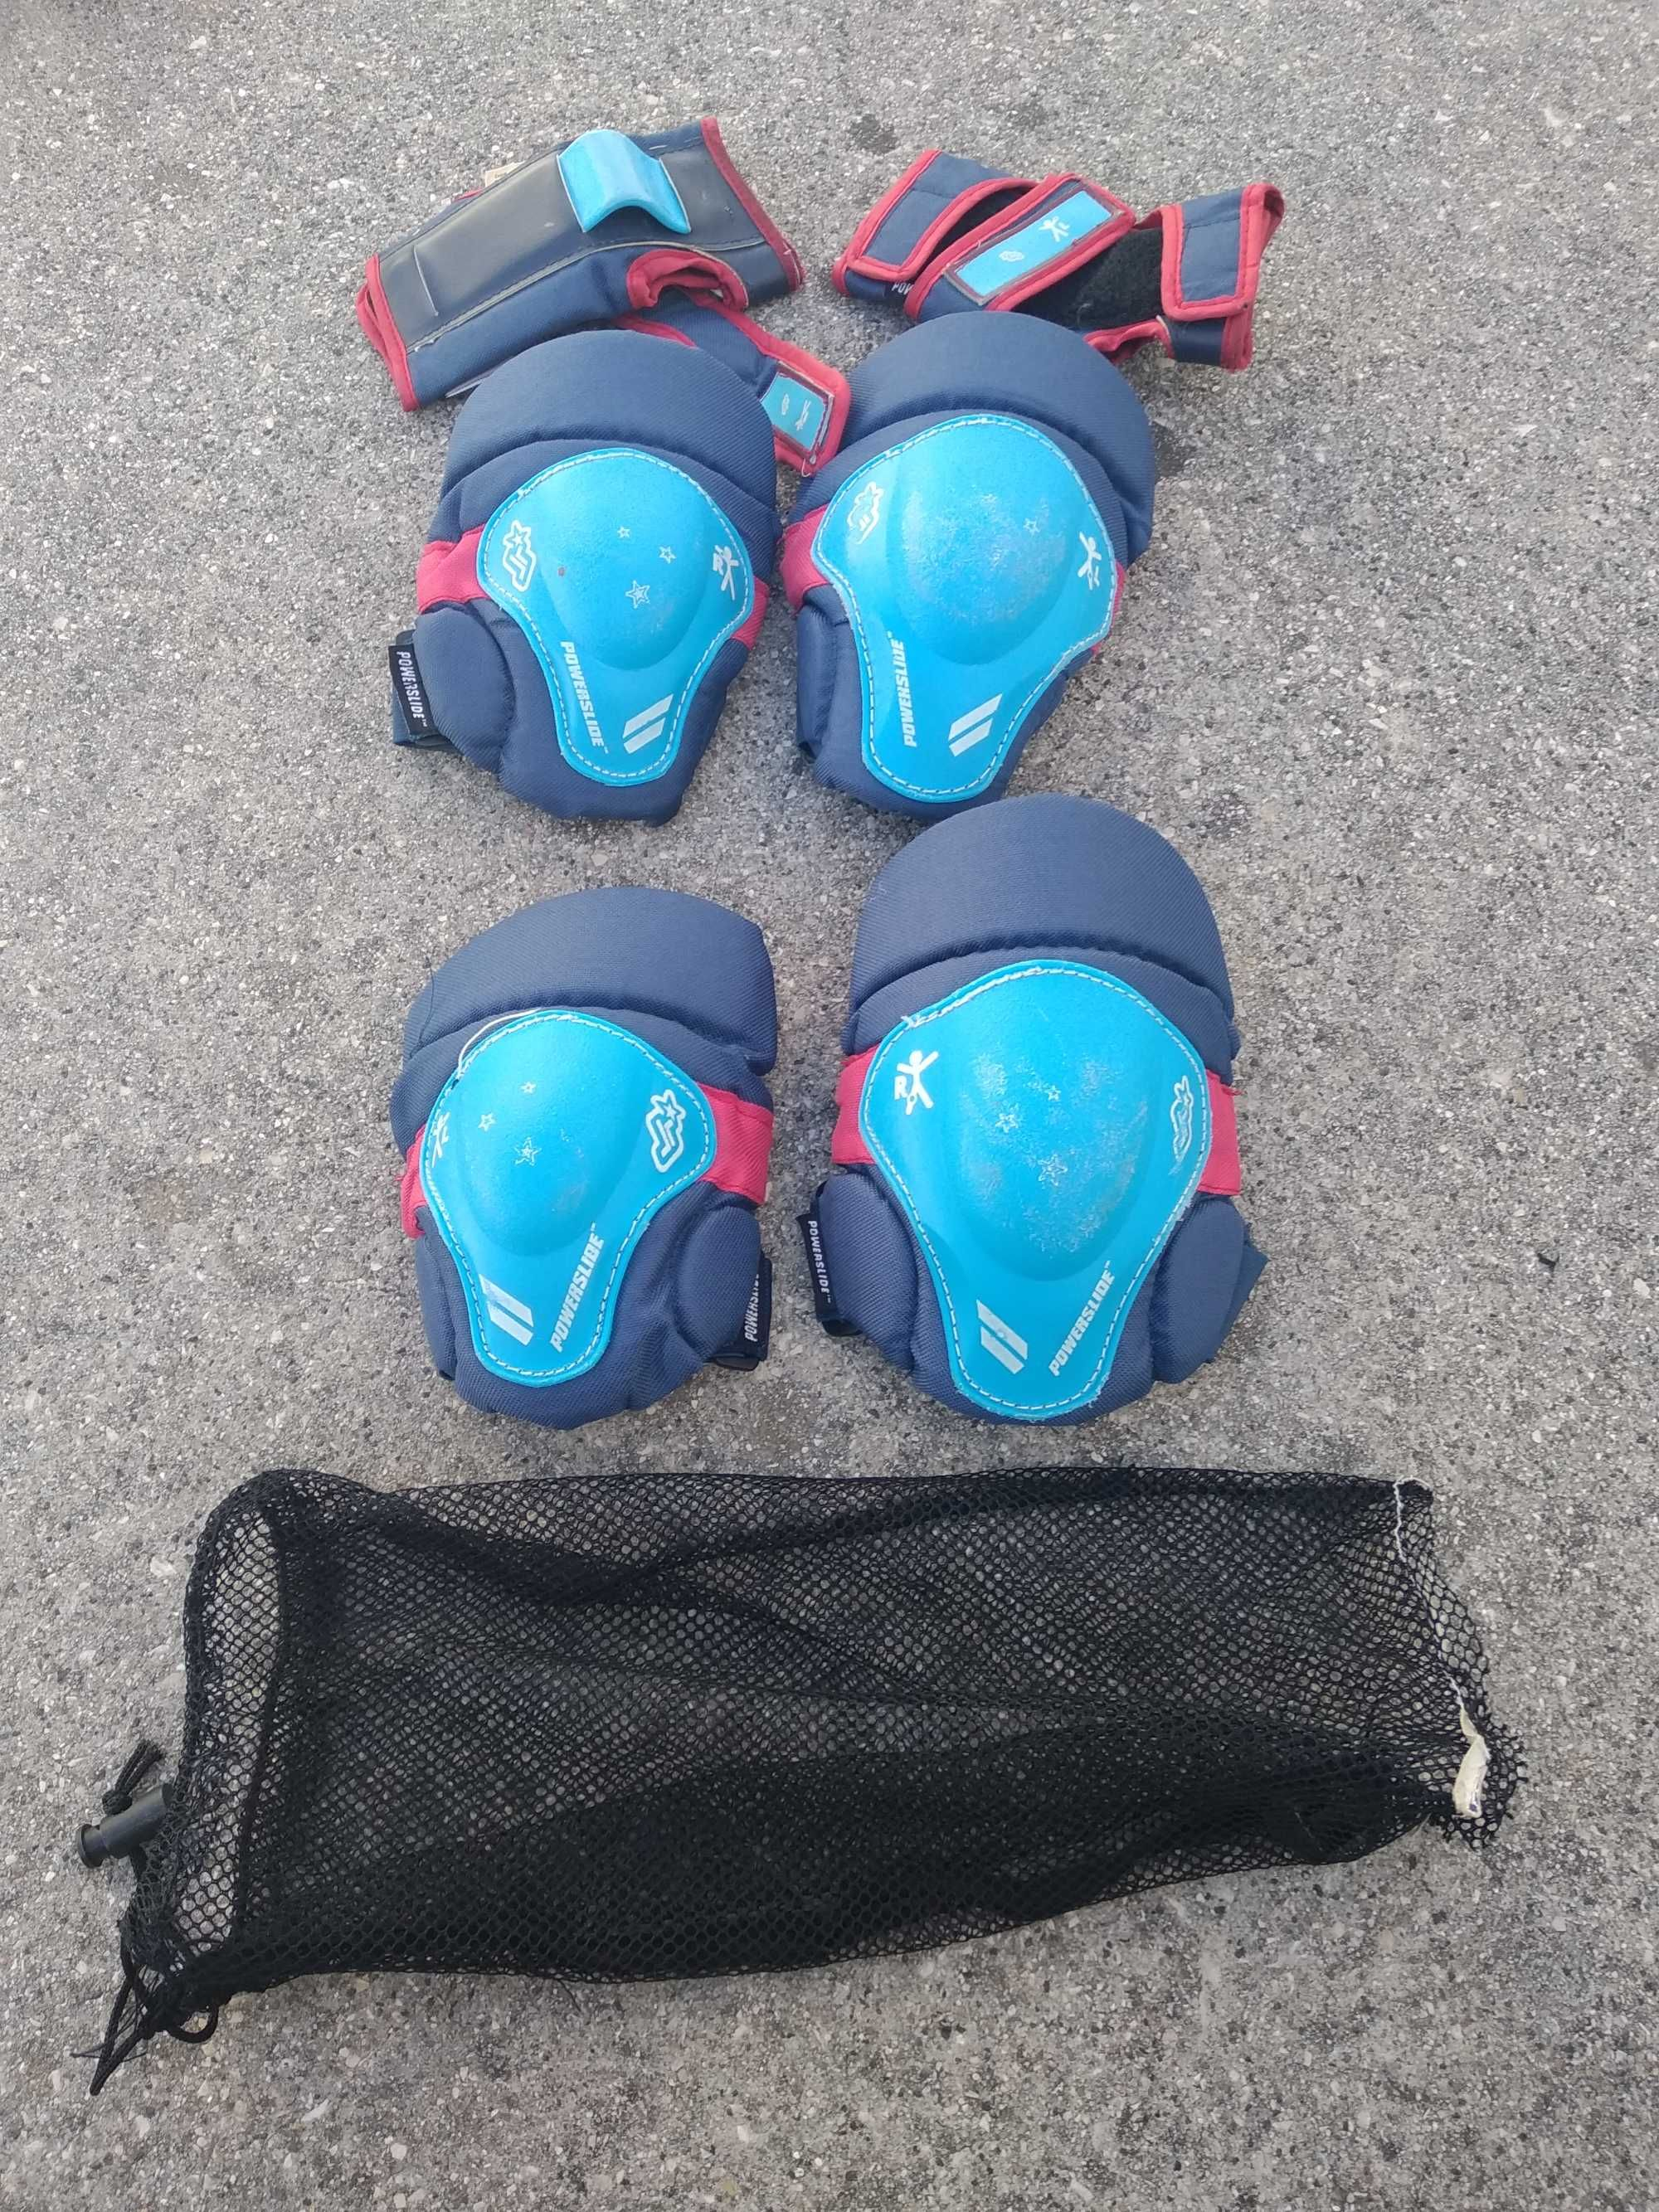 Kit de proteções para bicicleta, Patins, trotinete ou skate